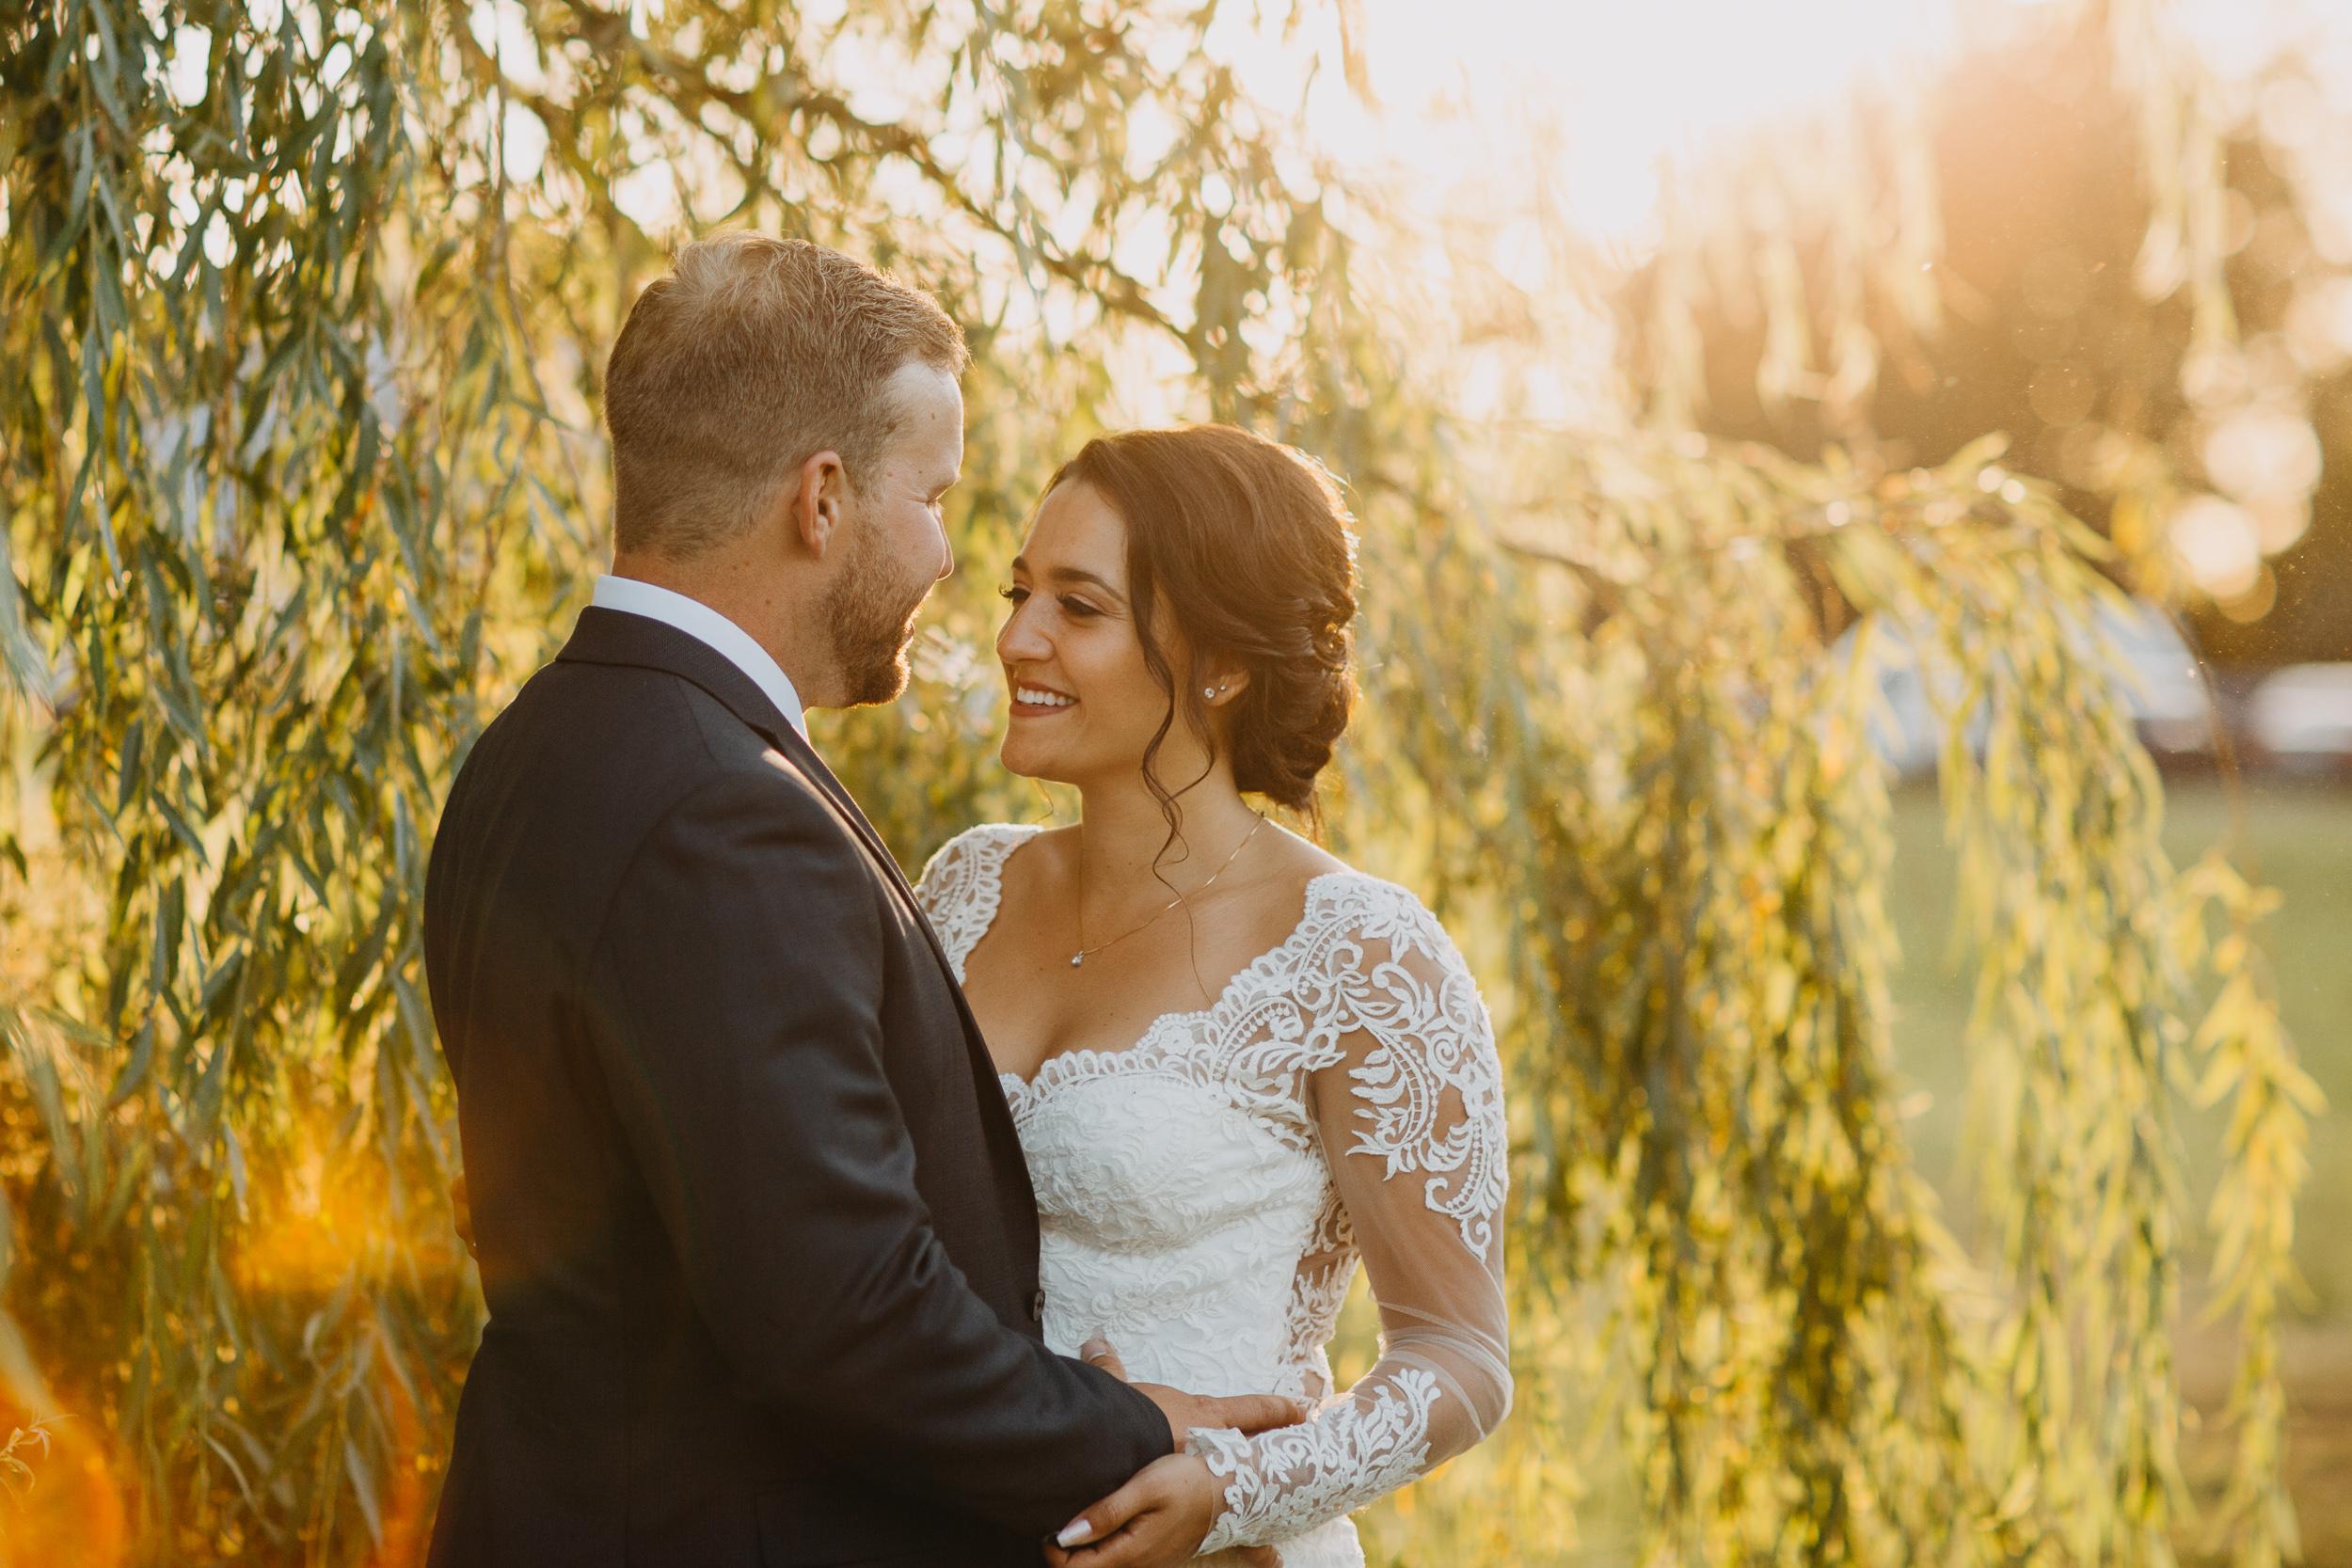 20170820 Savanna & Vince Wedding 475.jpg